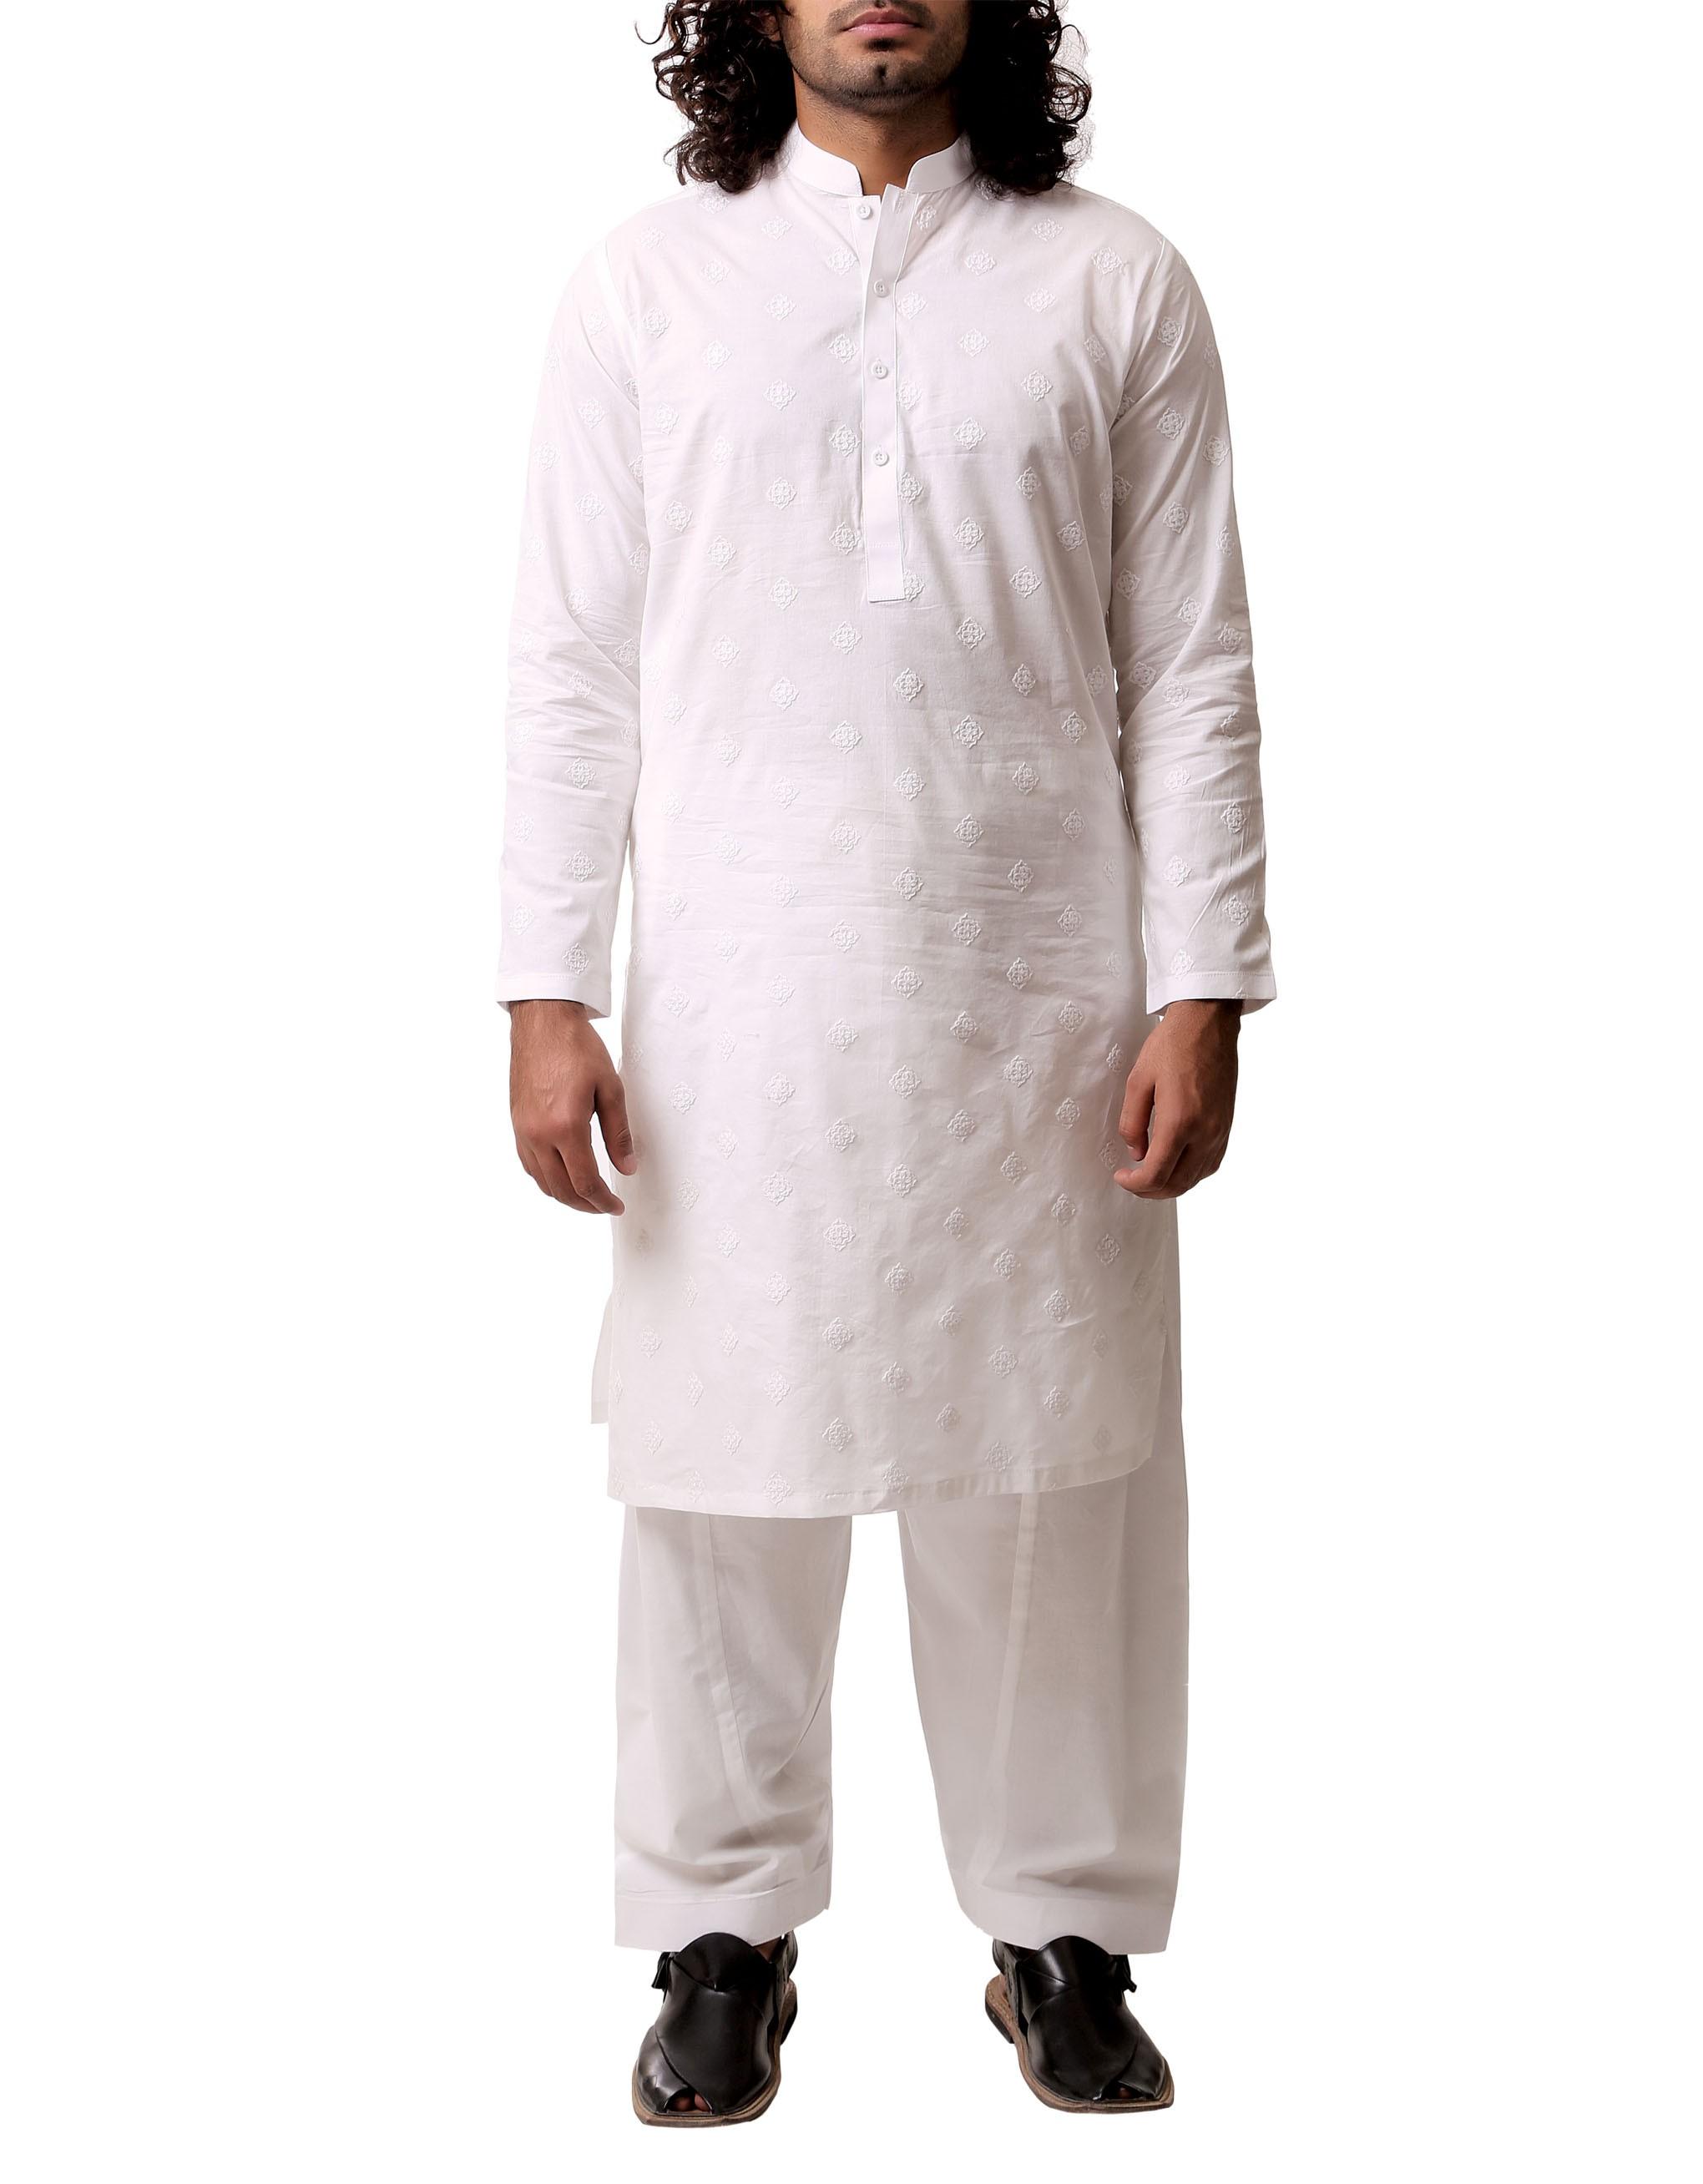 men's salwar suits for eid